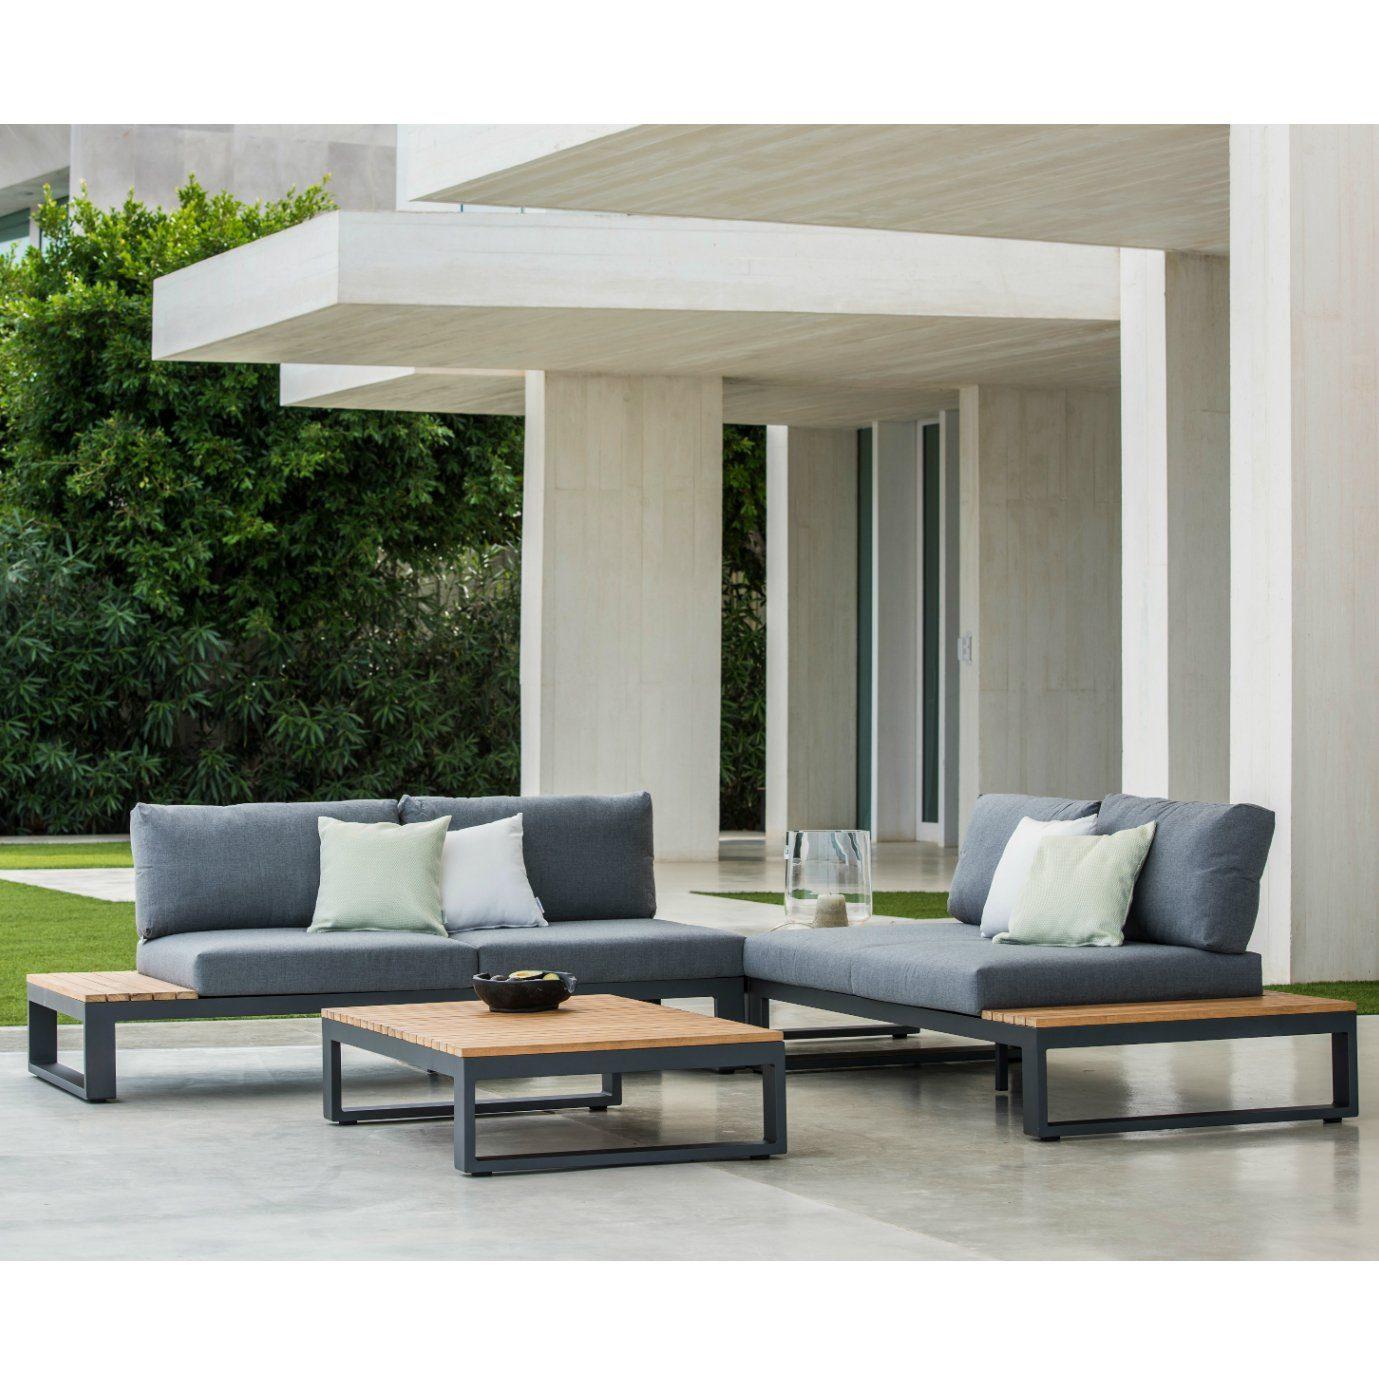 jati kebon virginia lounge set. Black Bedroom Furniture Sets. Home Design Ideas